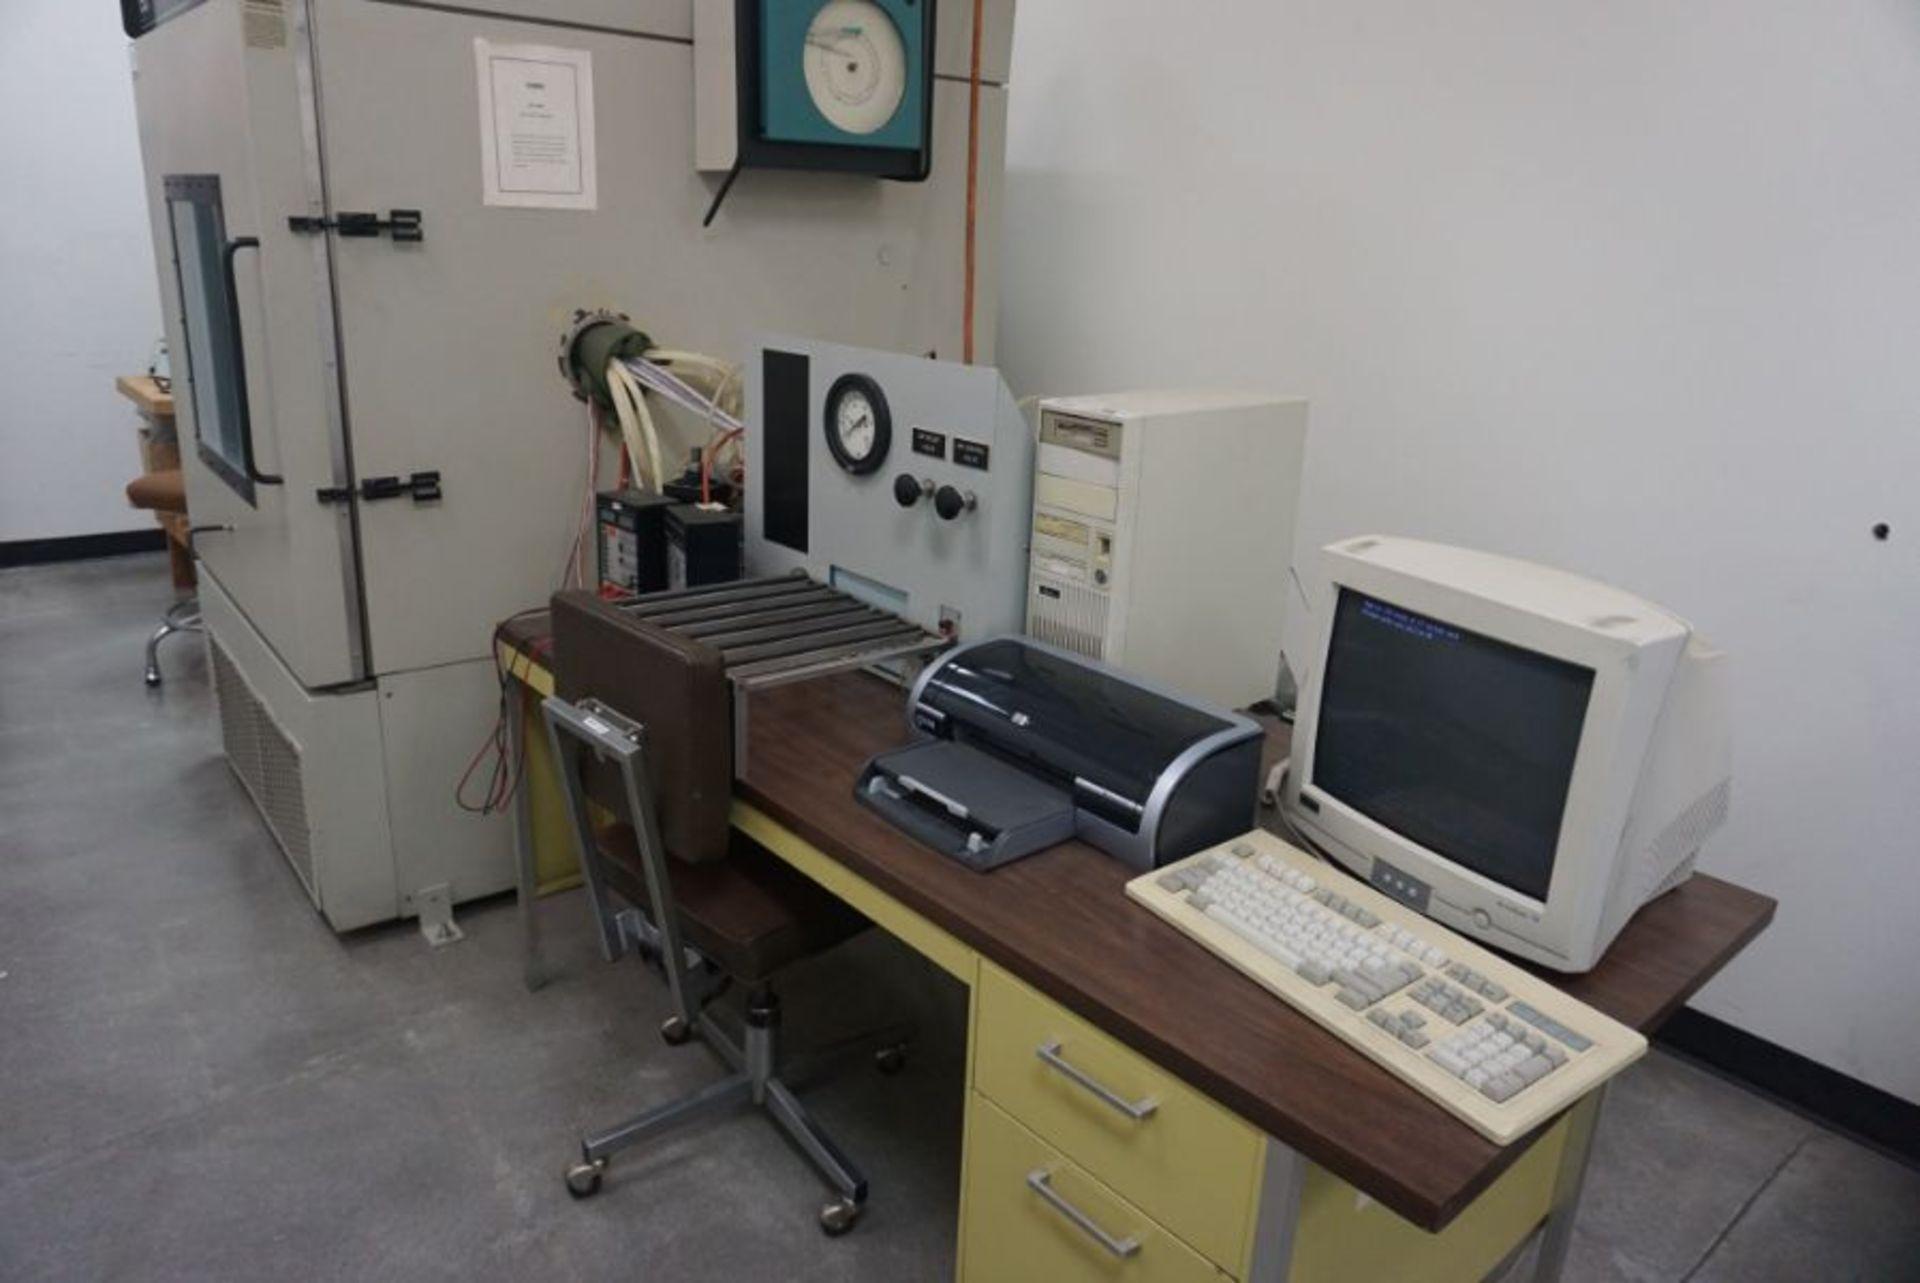 Cincinnati Sub-Zero Environmental Test Chambers - Image 3 of 3